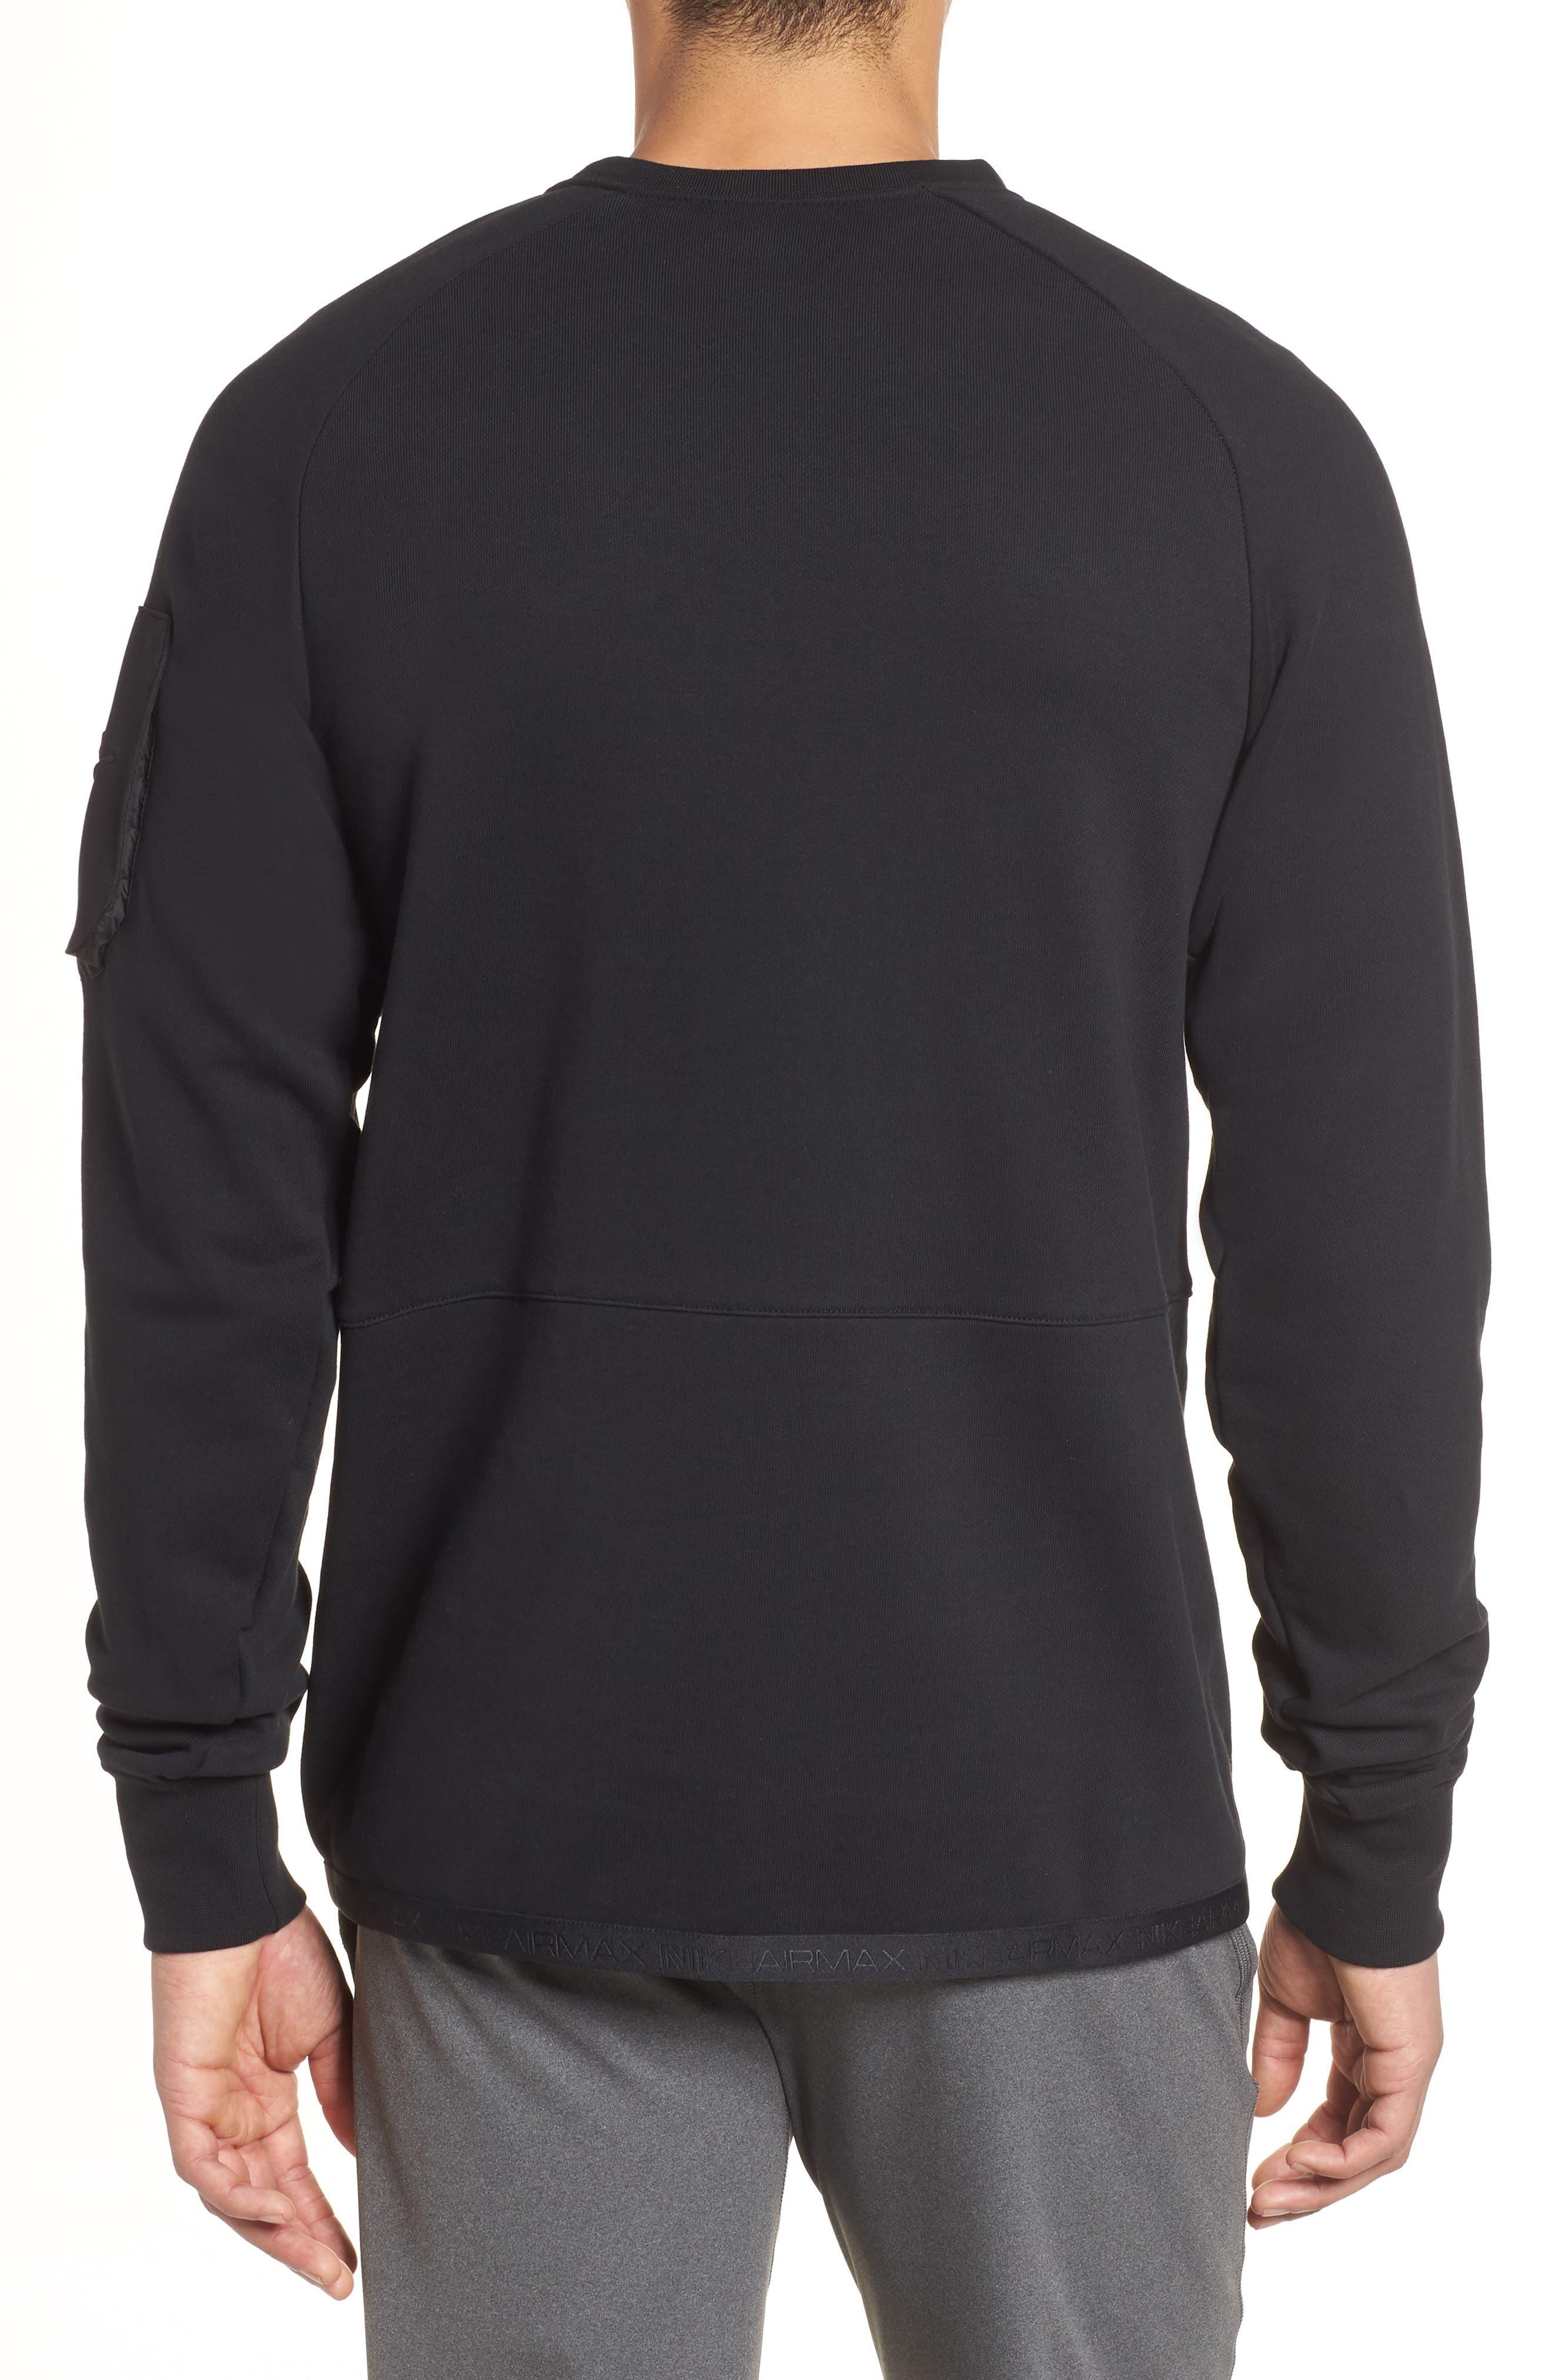 NSW Air Max Crewneck Sweatshirt,                             Alternate thumbnail 2, color,                             BLACK/ BLACK/ BLACK